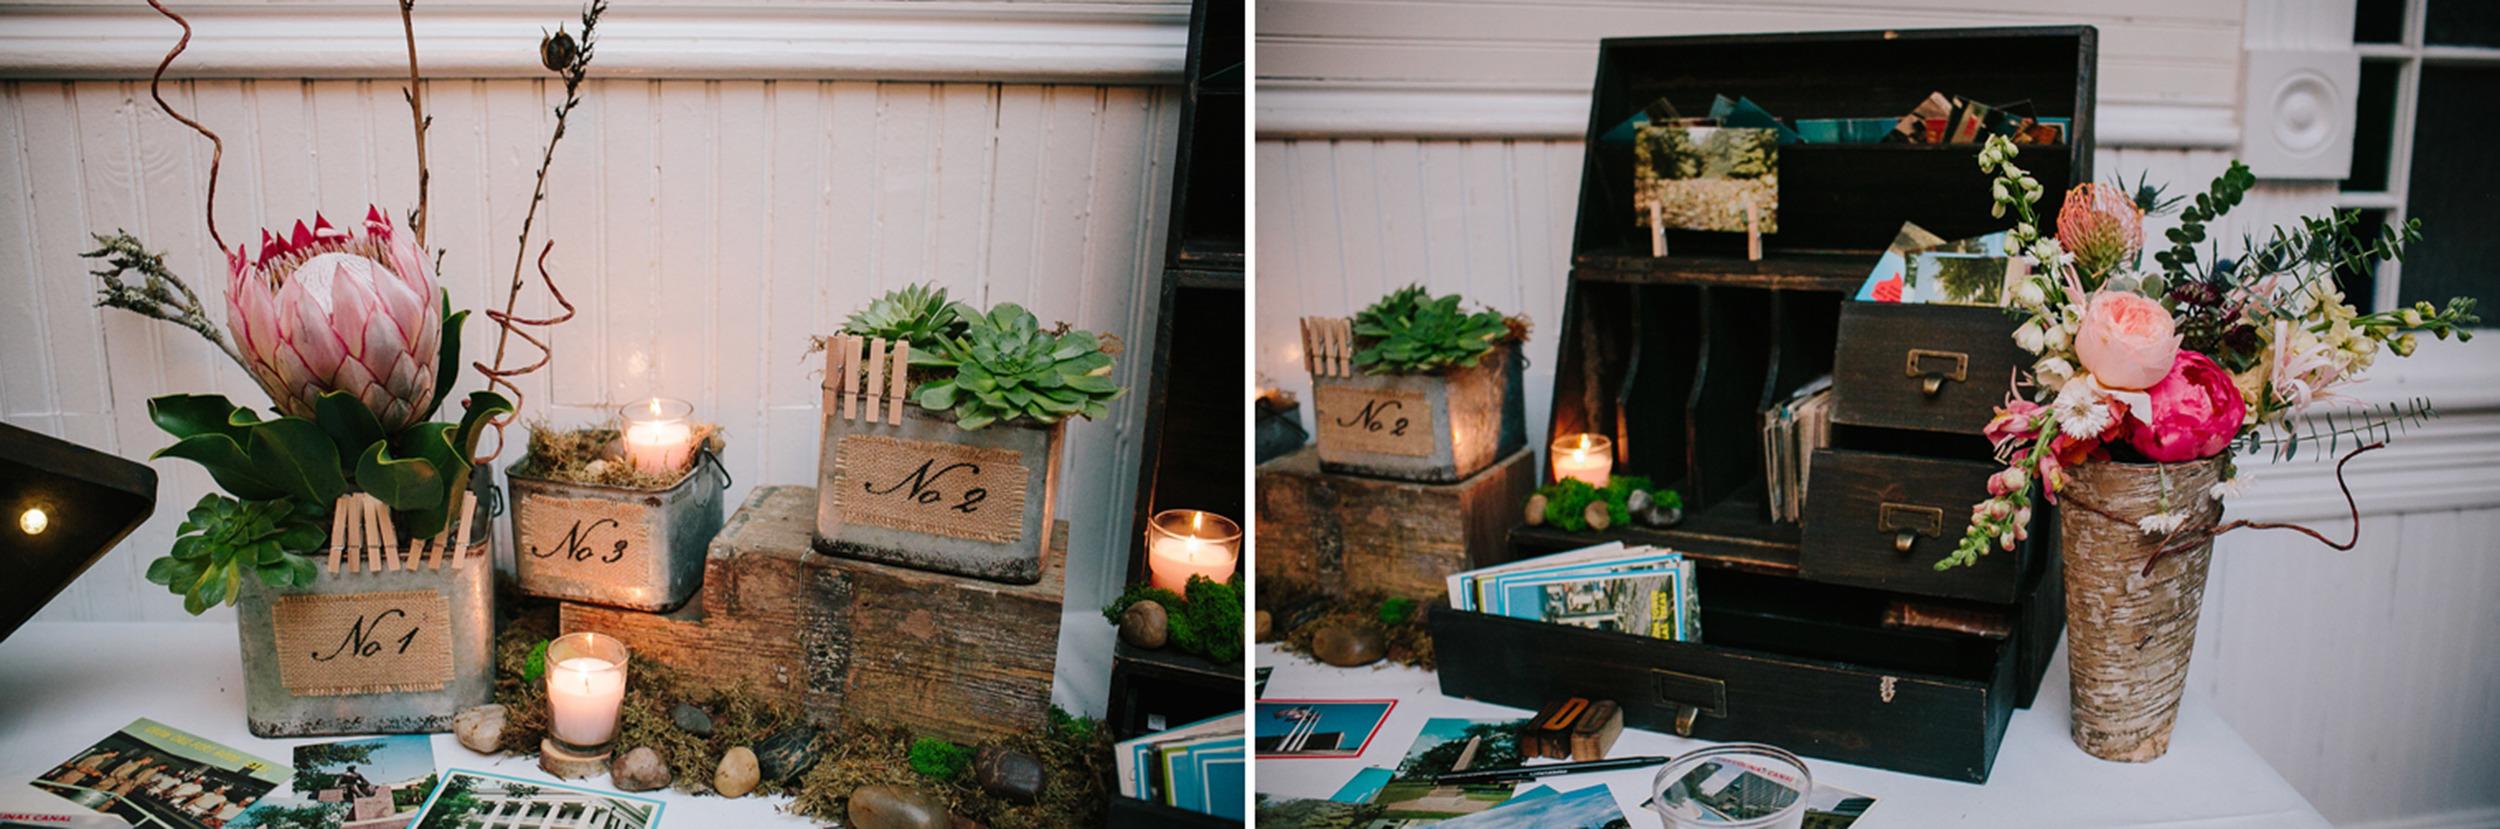 AustinWeddingPhotographer-Mercury-Hall066.jpg